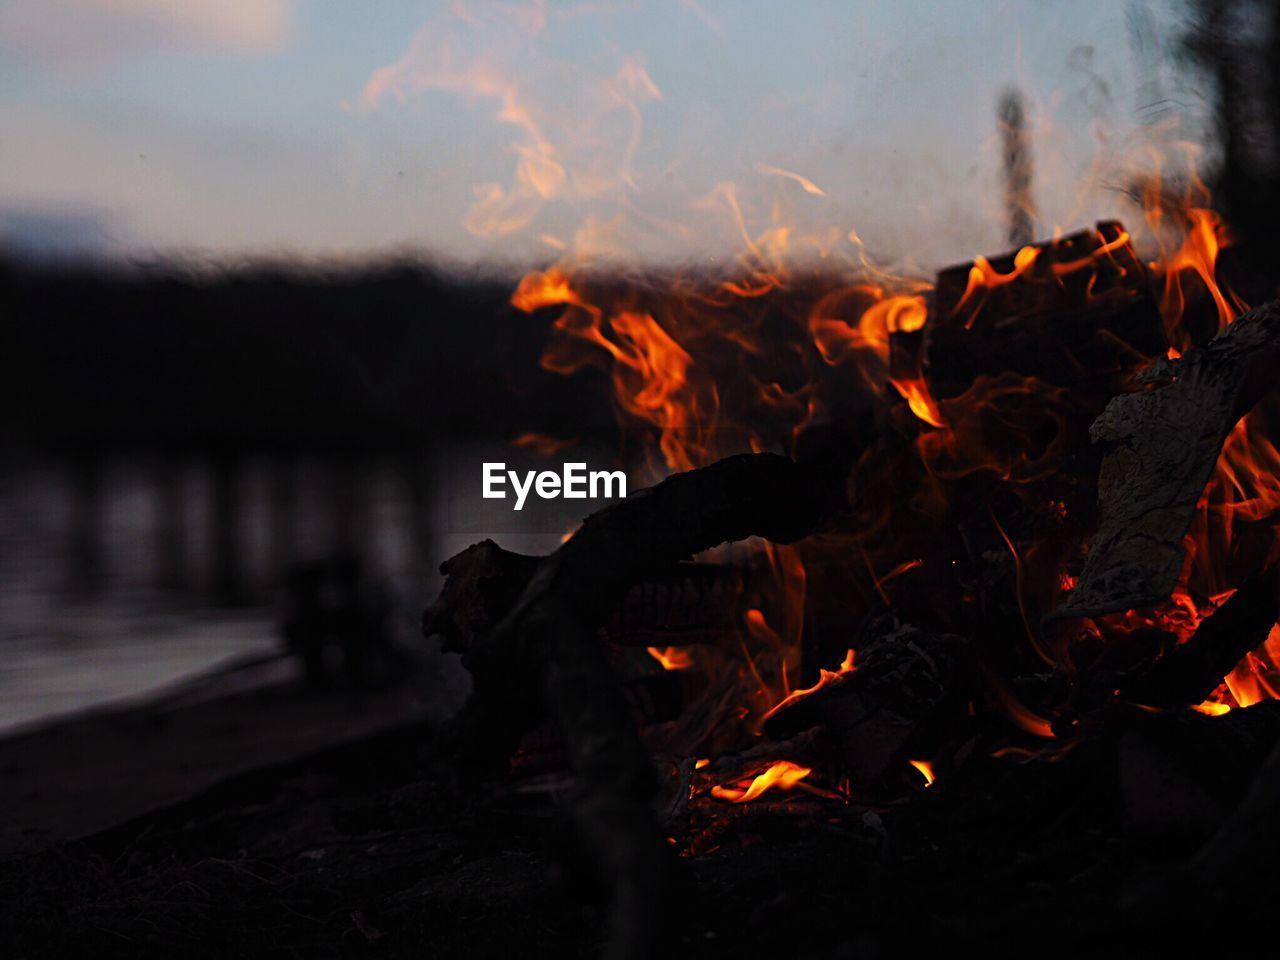 Close-Up Of Burning Bonfire During Sunset